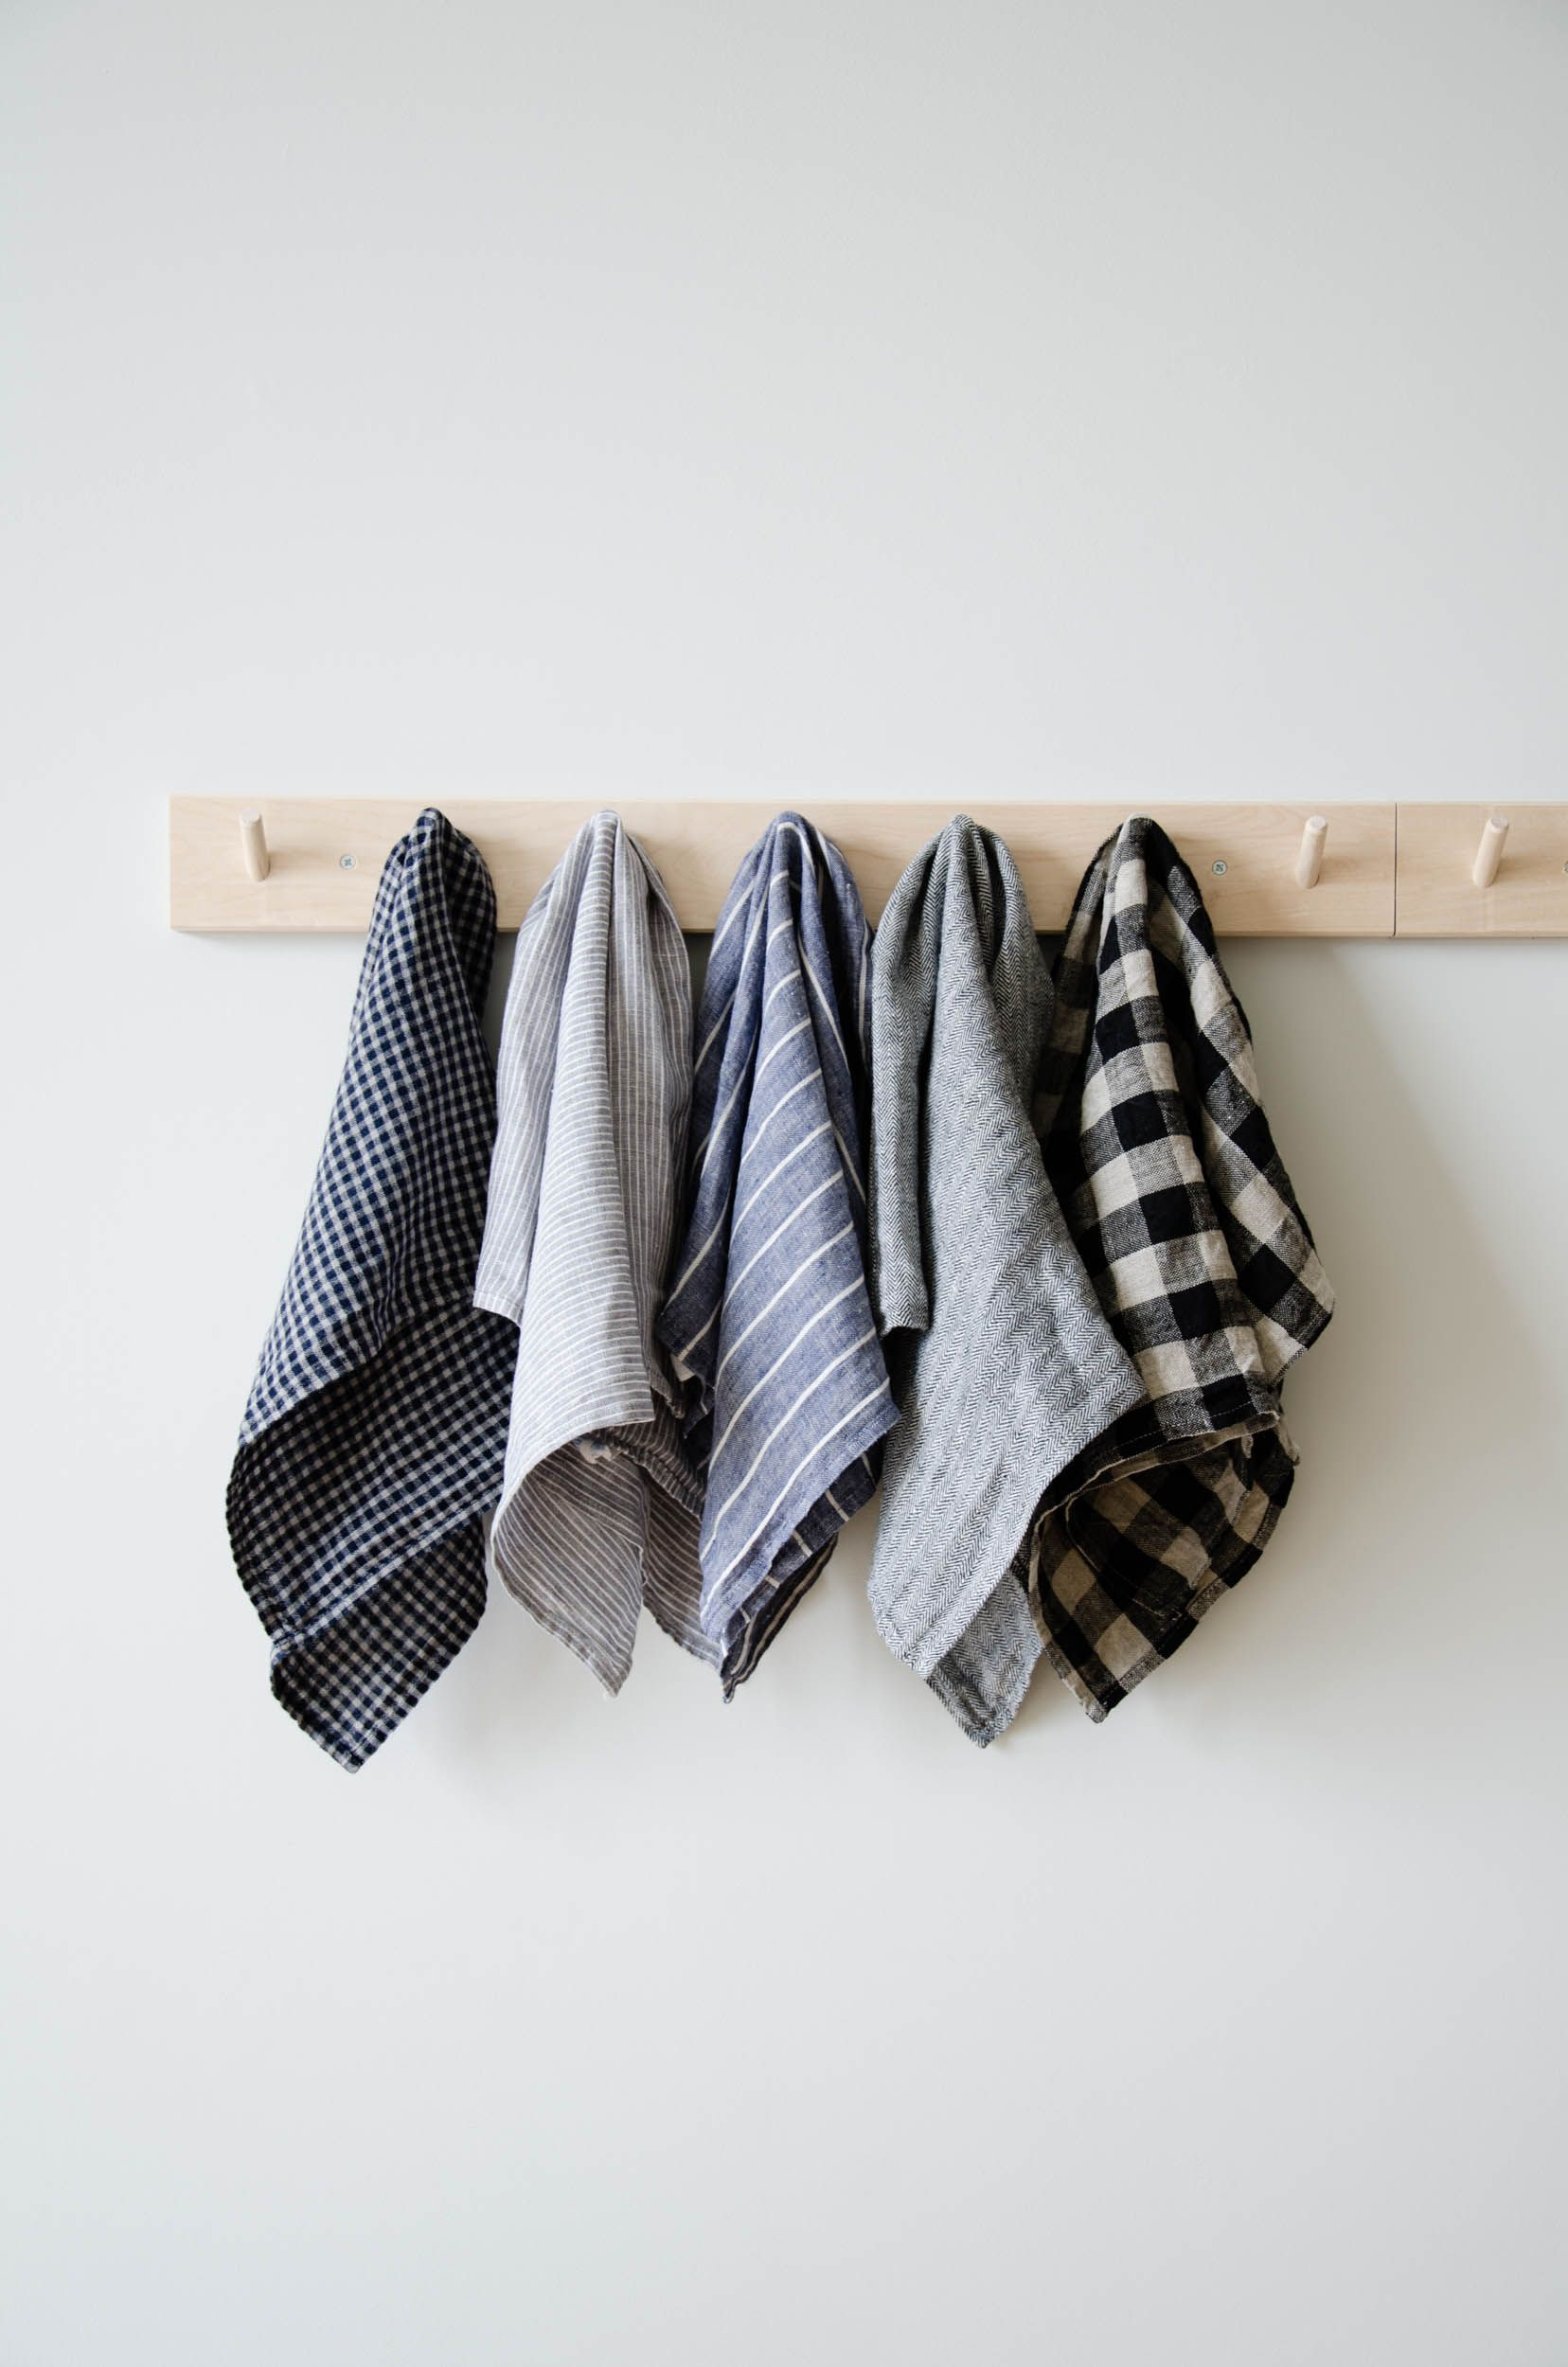 gray kitchen towels delta talbott faucet linen tea reusable cloth napkins zero waste essential